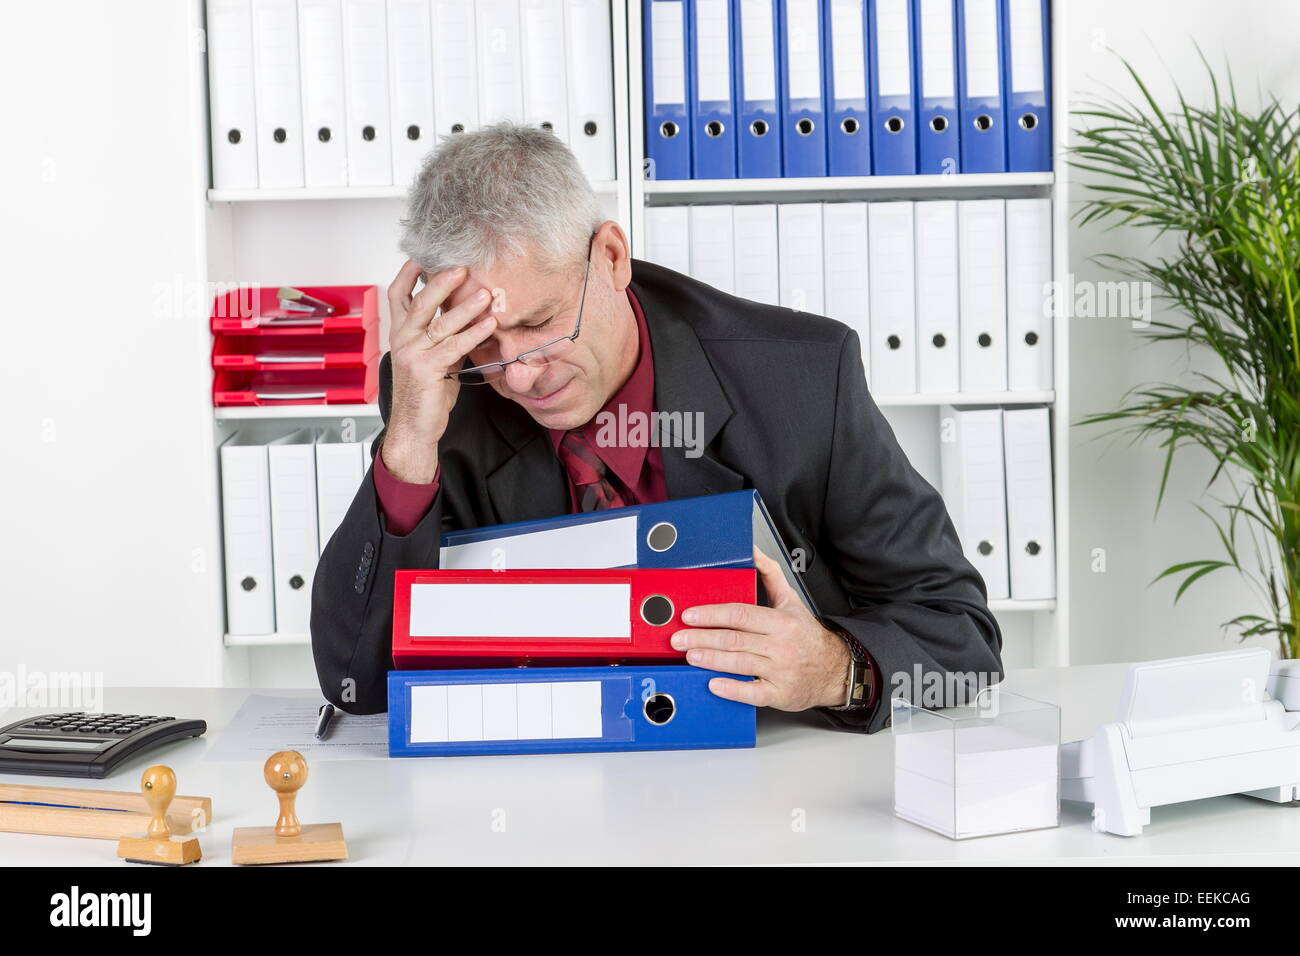 Mann mittleren Alters sitzt im Büro, hält sich den Kopf, hat Kopfschmerzen, Middle-aged man with a headache, - Stock Image